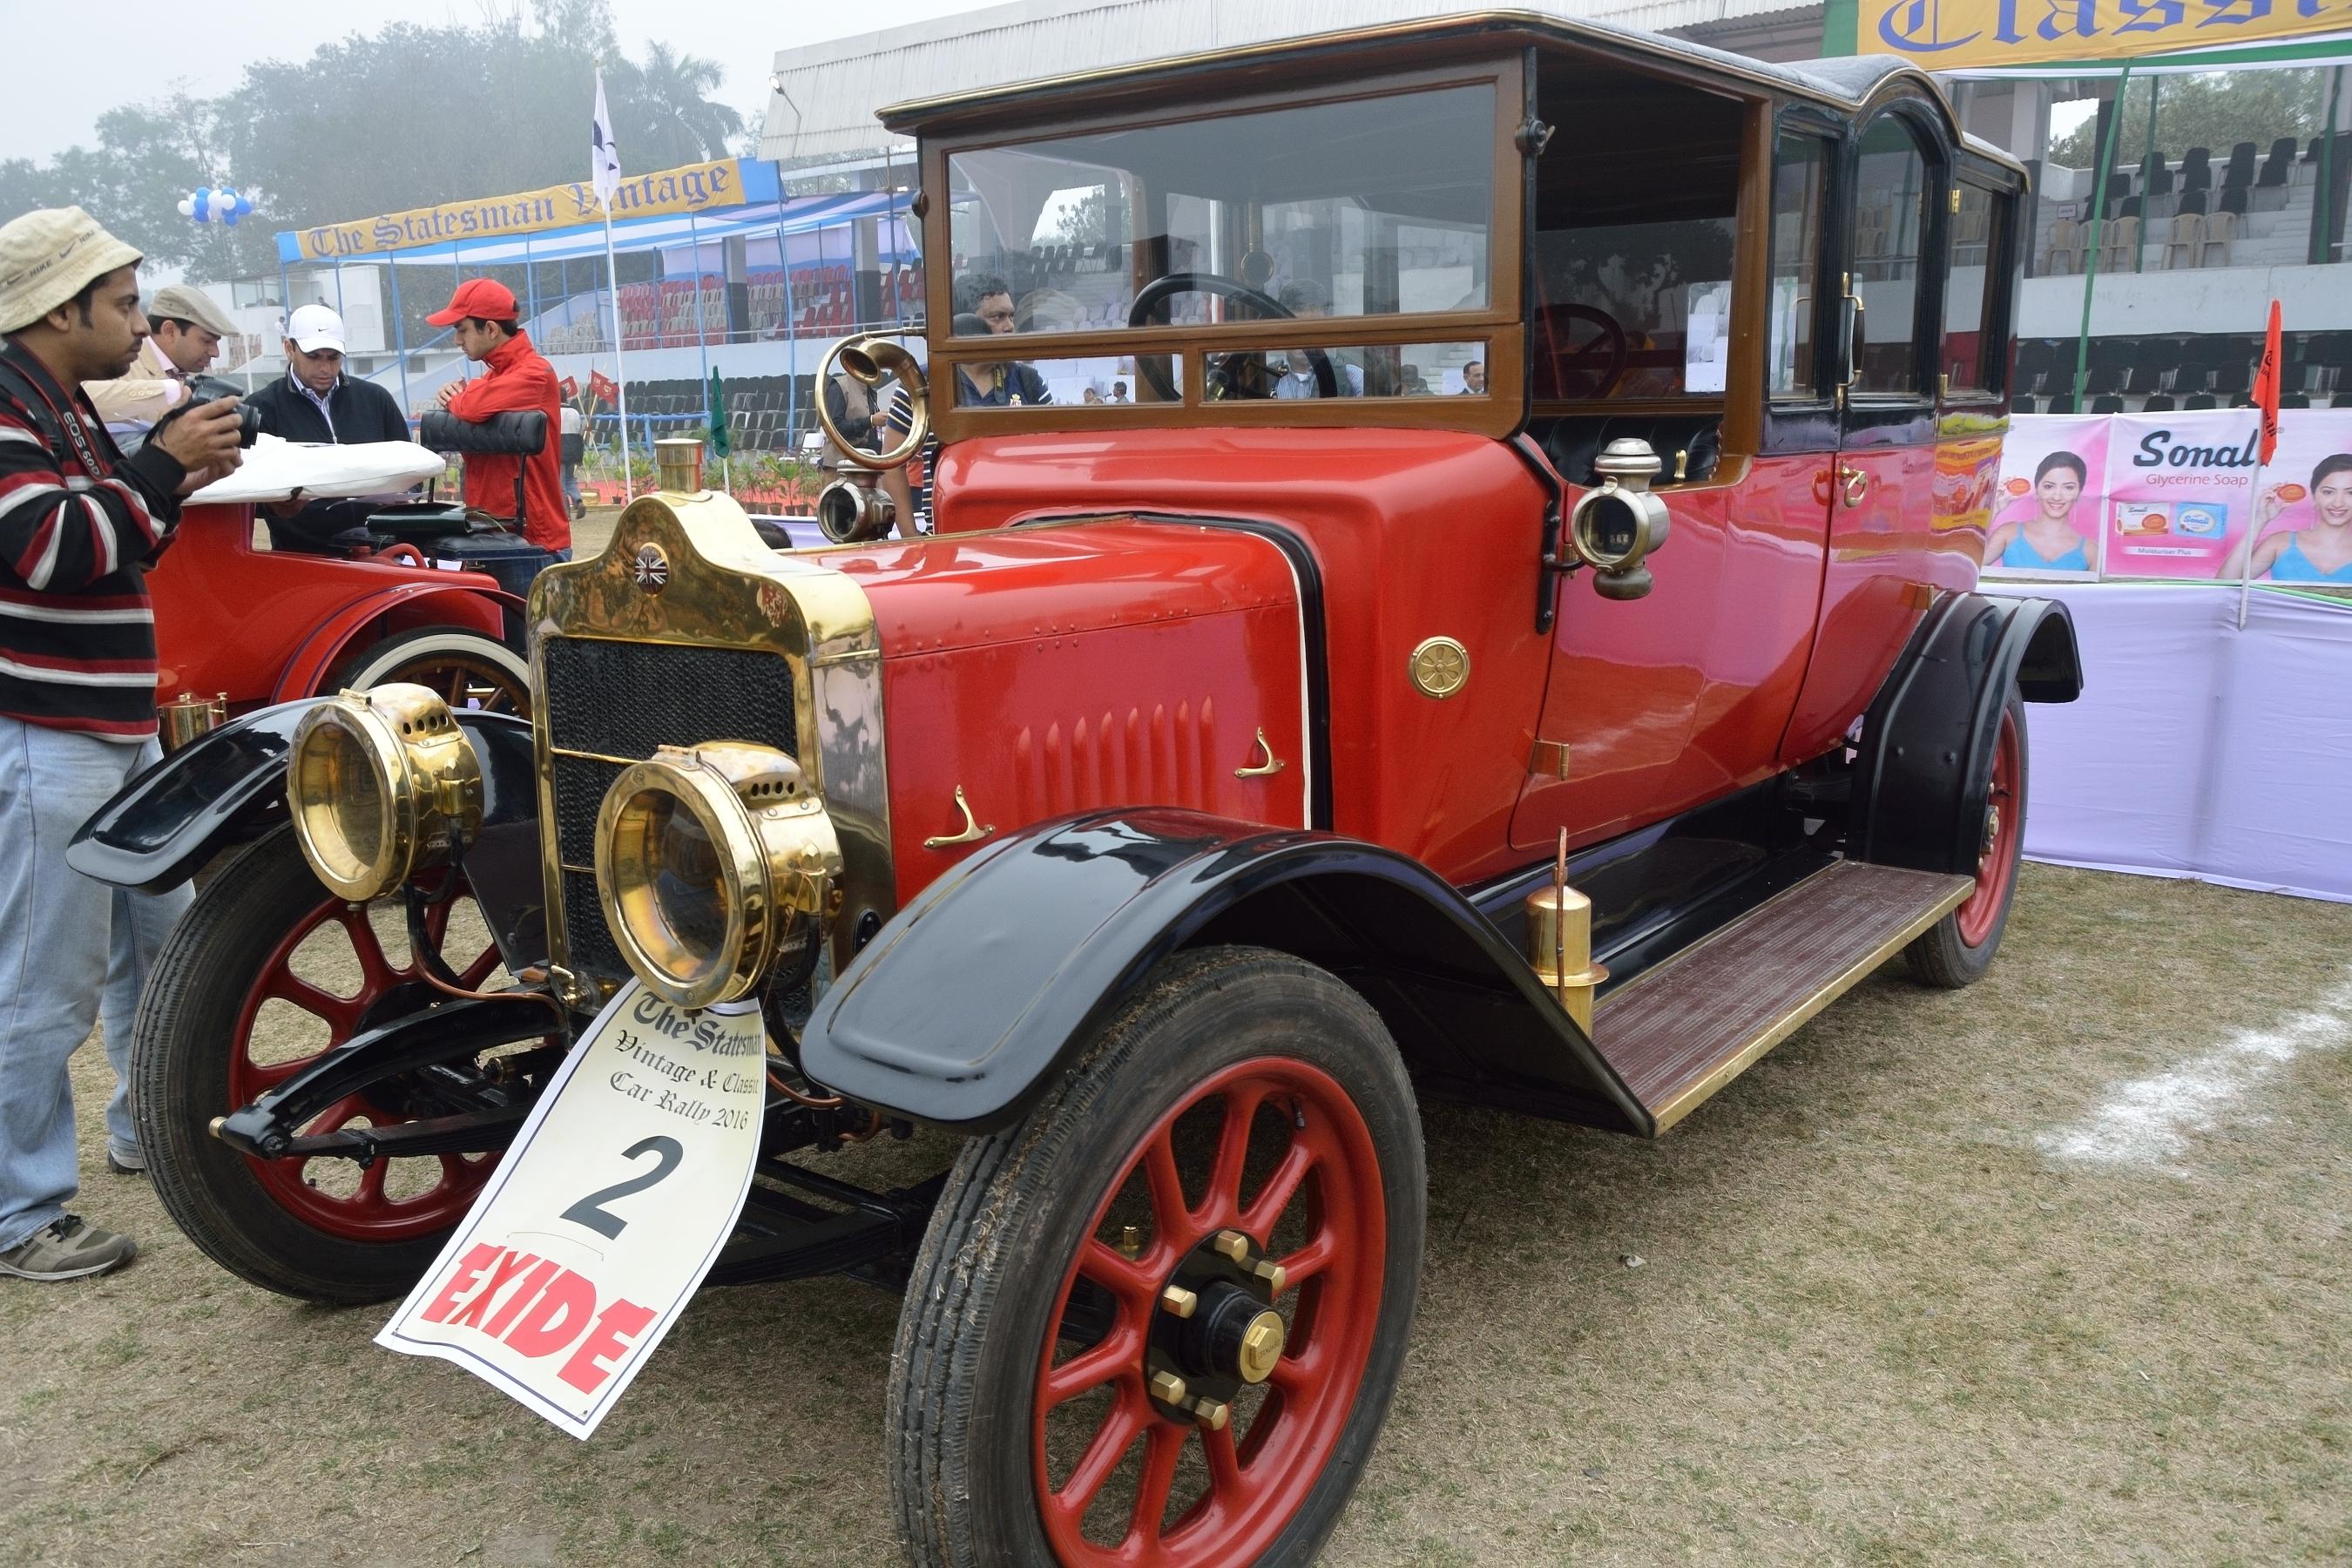 File:Vintage Car Rally 2016 04.jpg - Wikimedia Commons